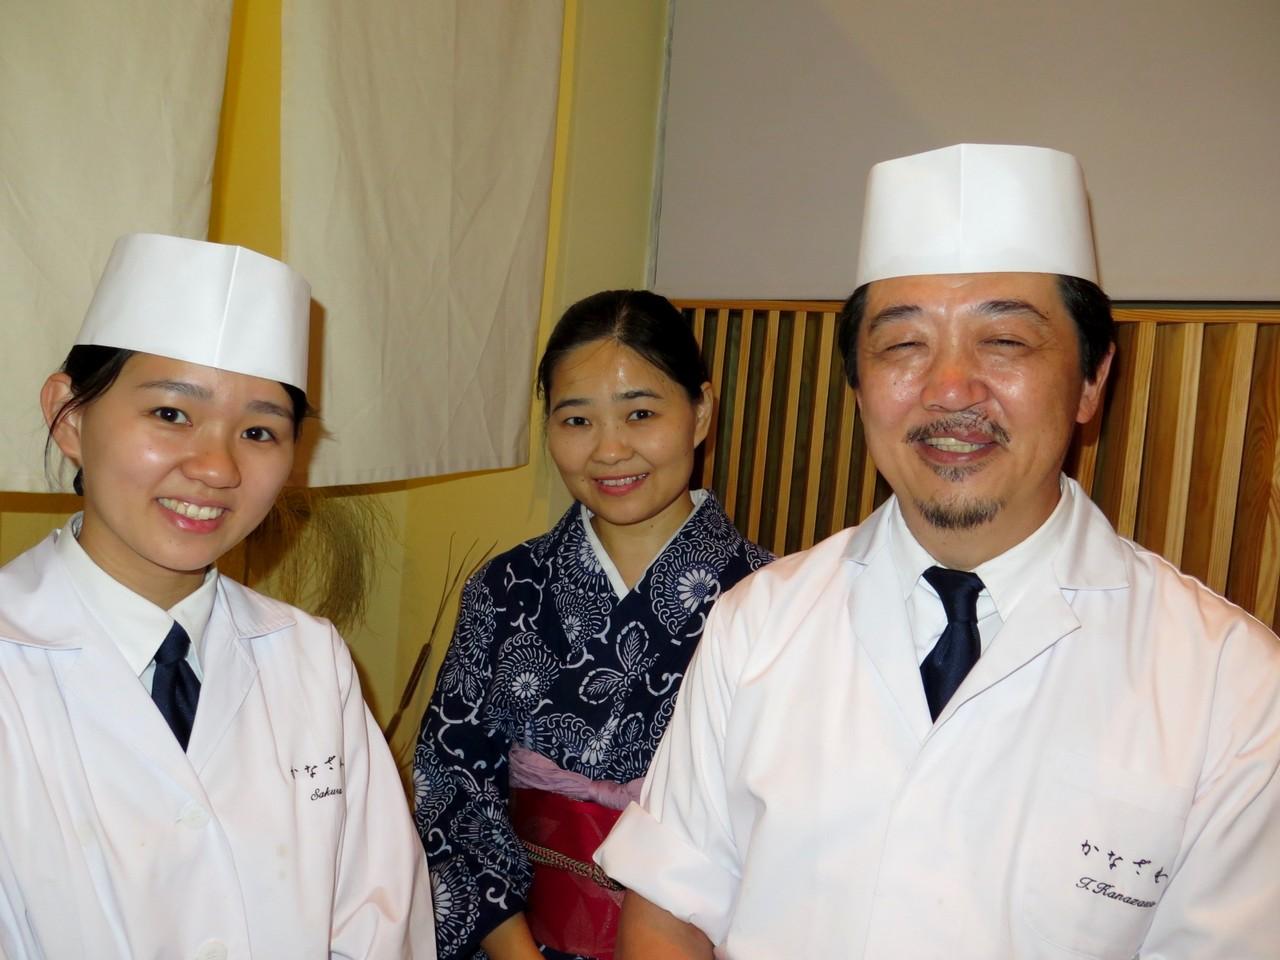 Sakura, Kayo e Tomoaki, os Kanazawa em Lisboa